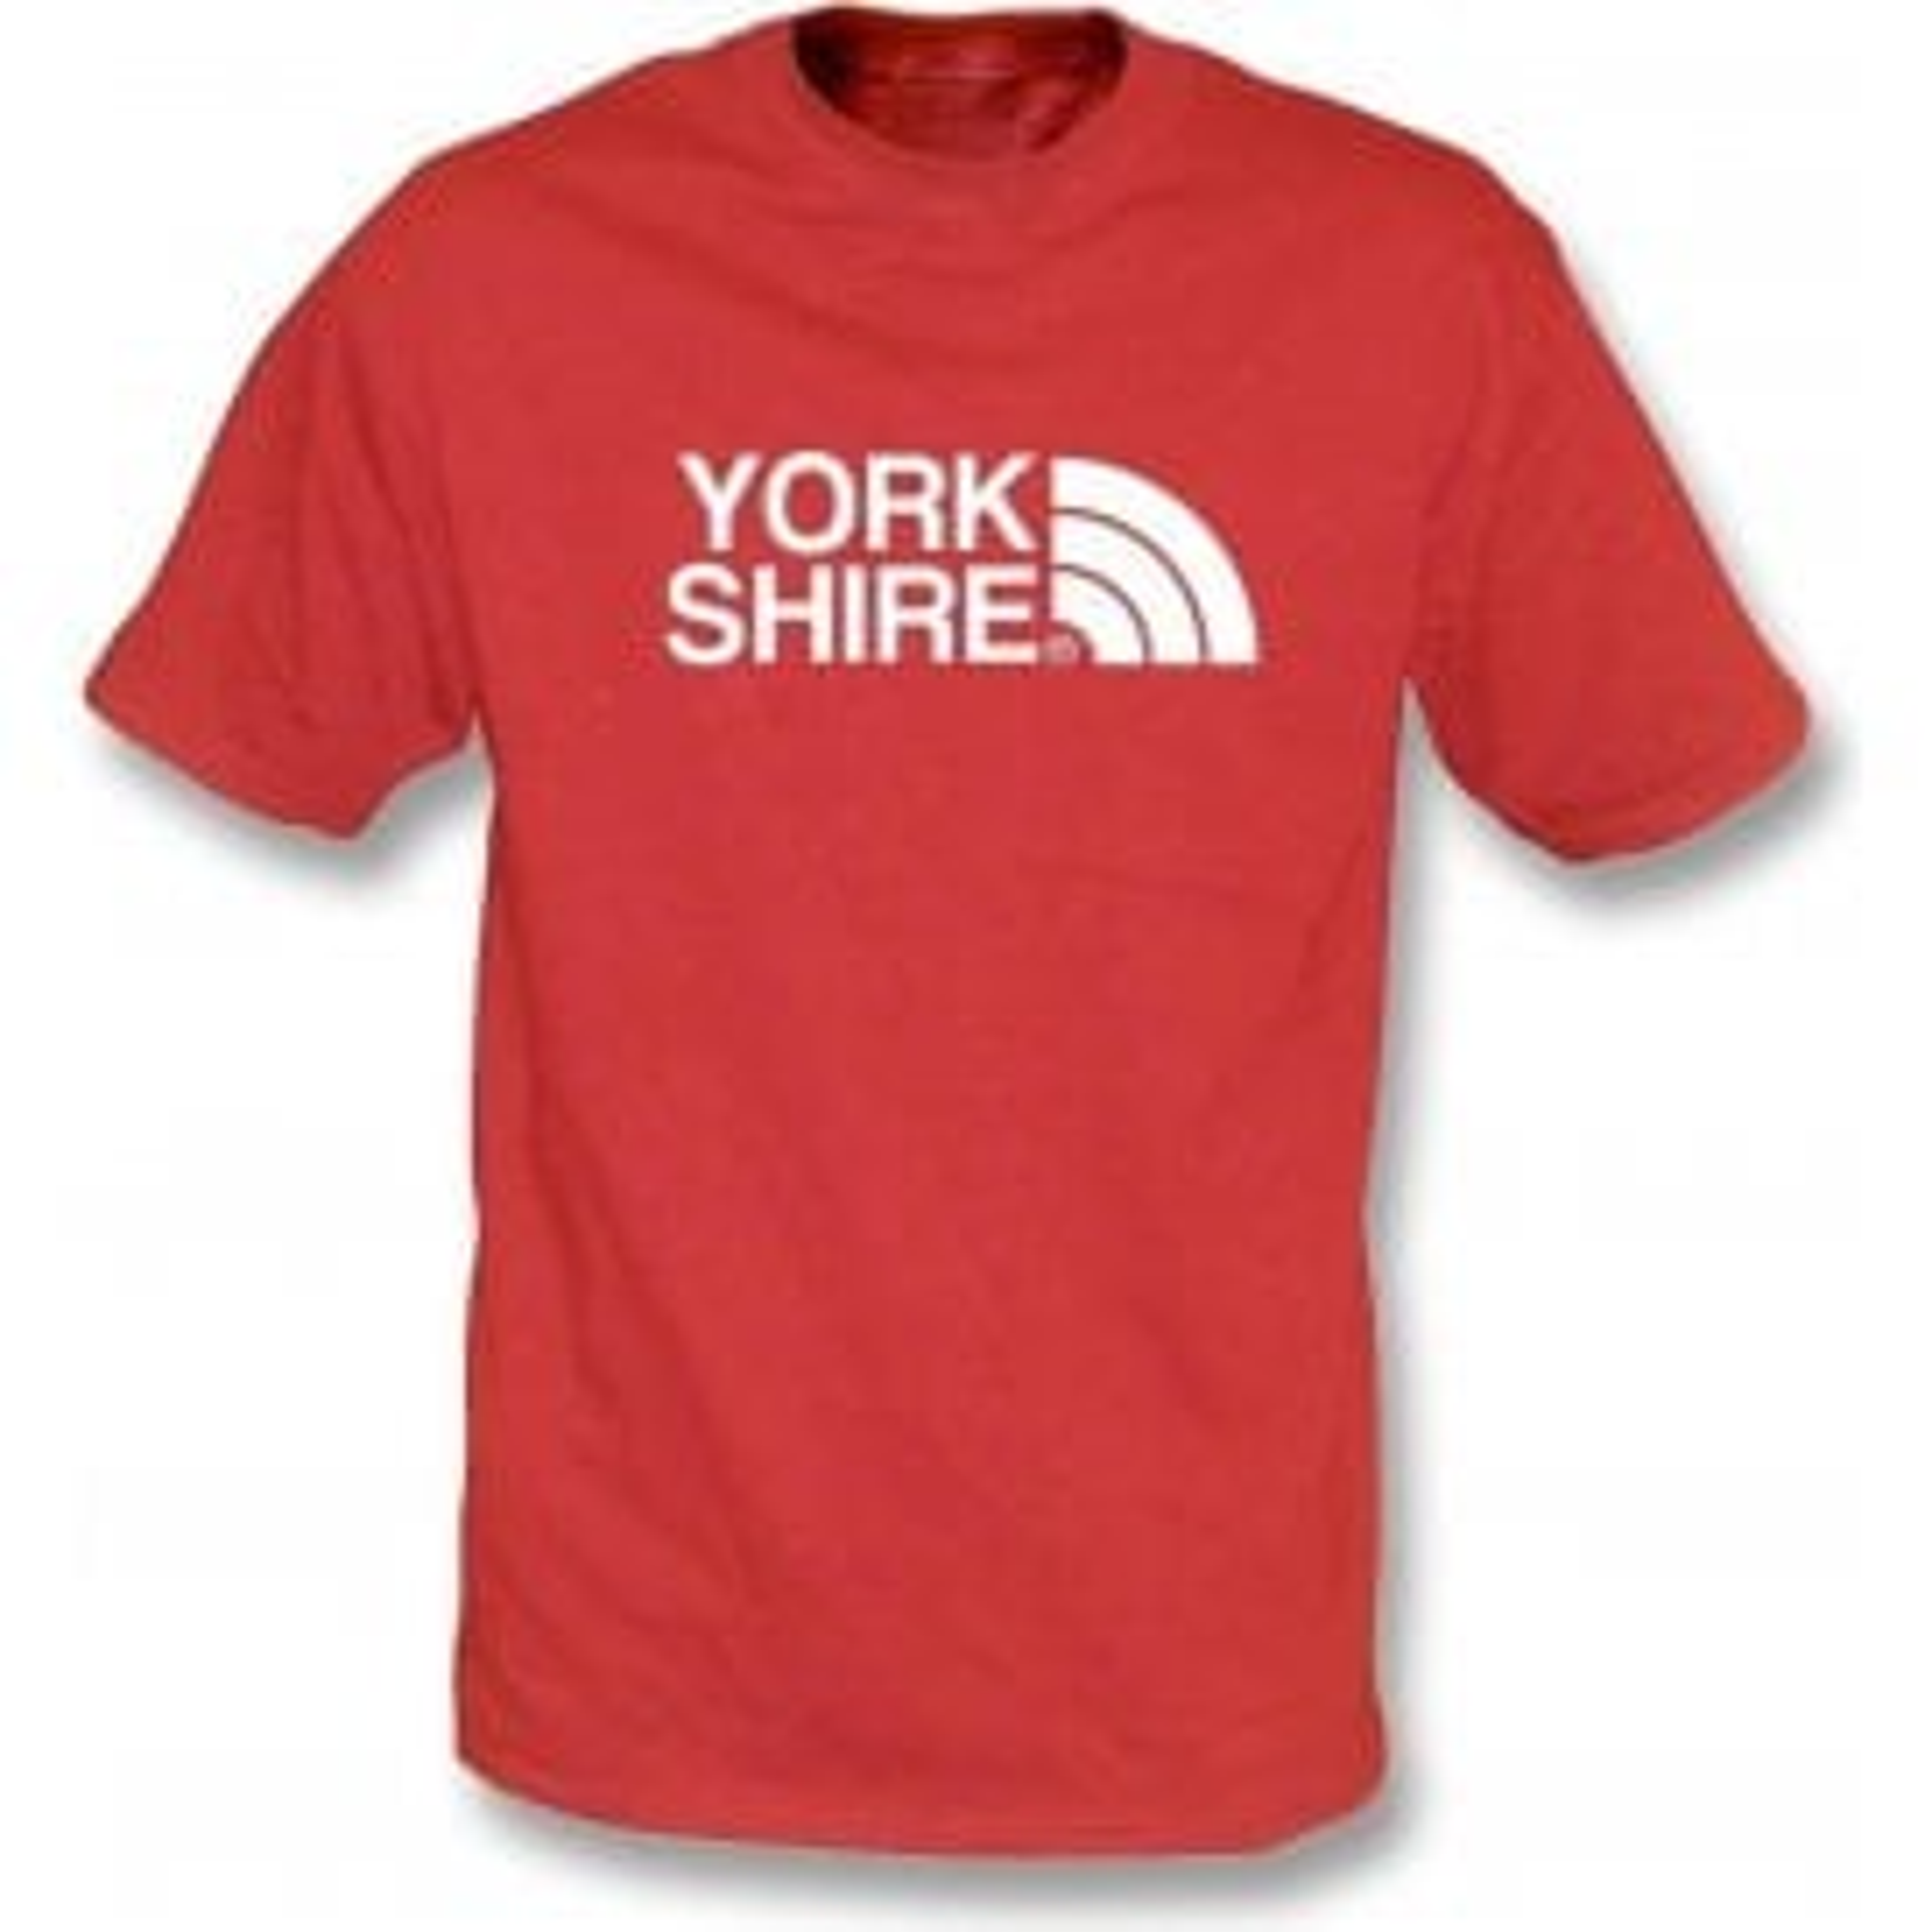 Yorkshire (Sheffield United) T-Shirt